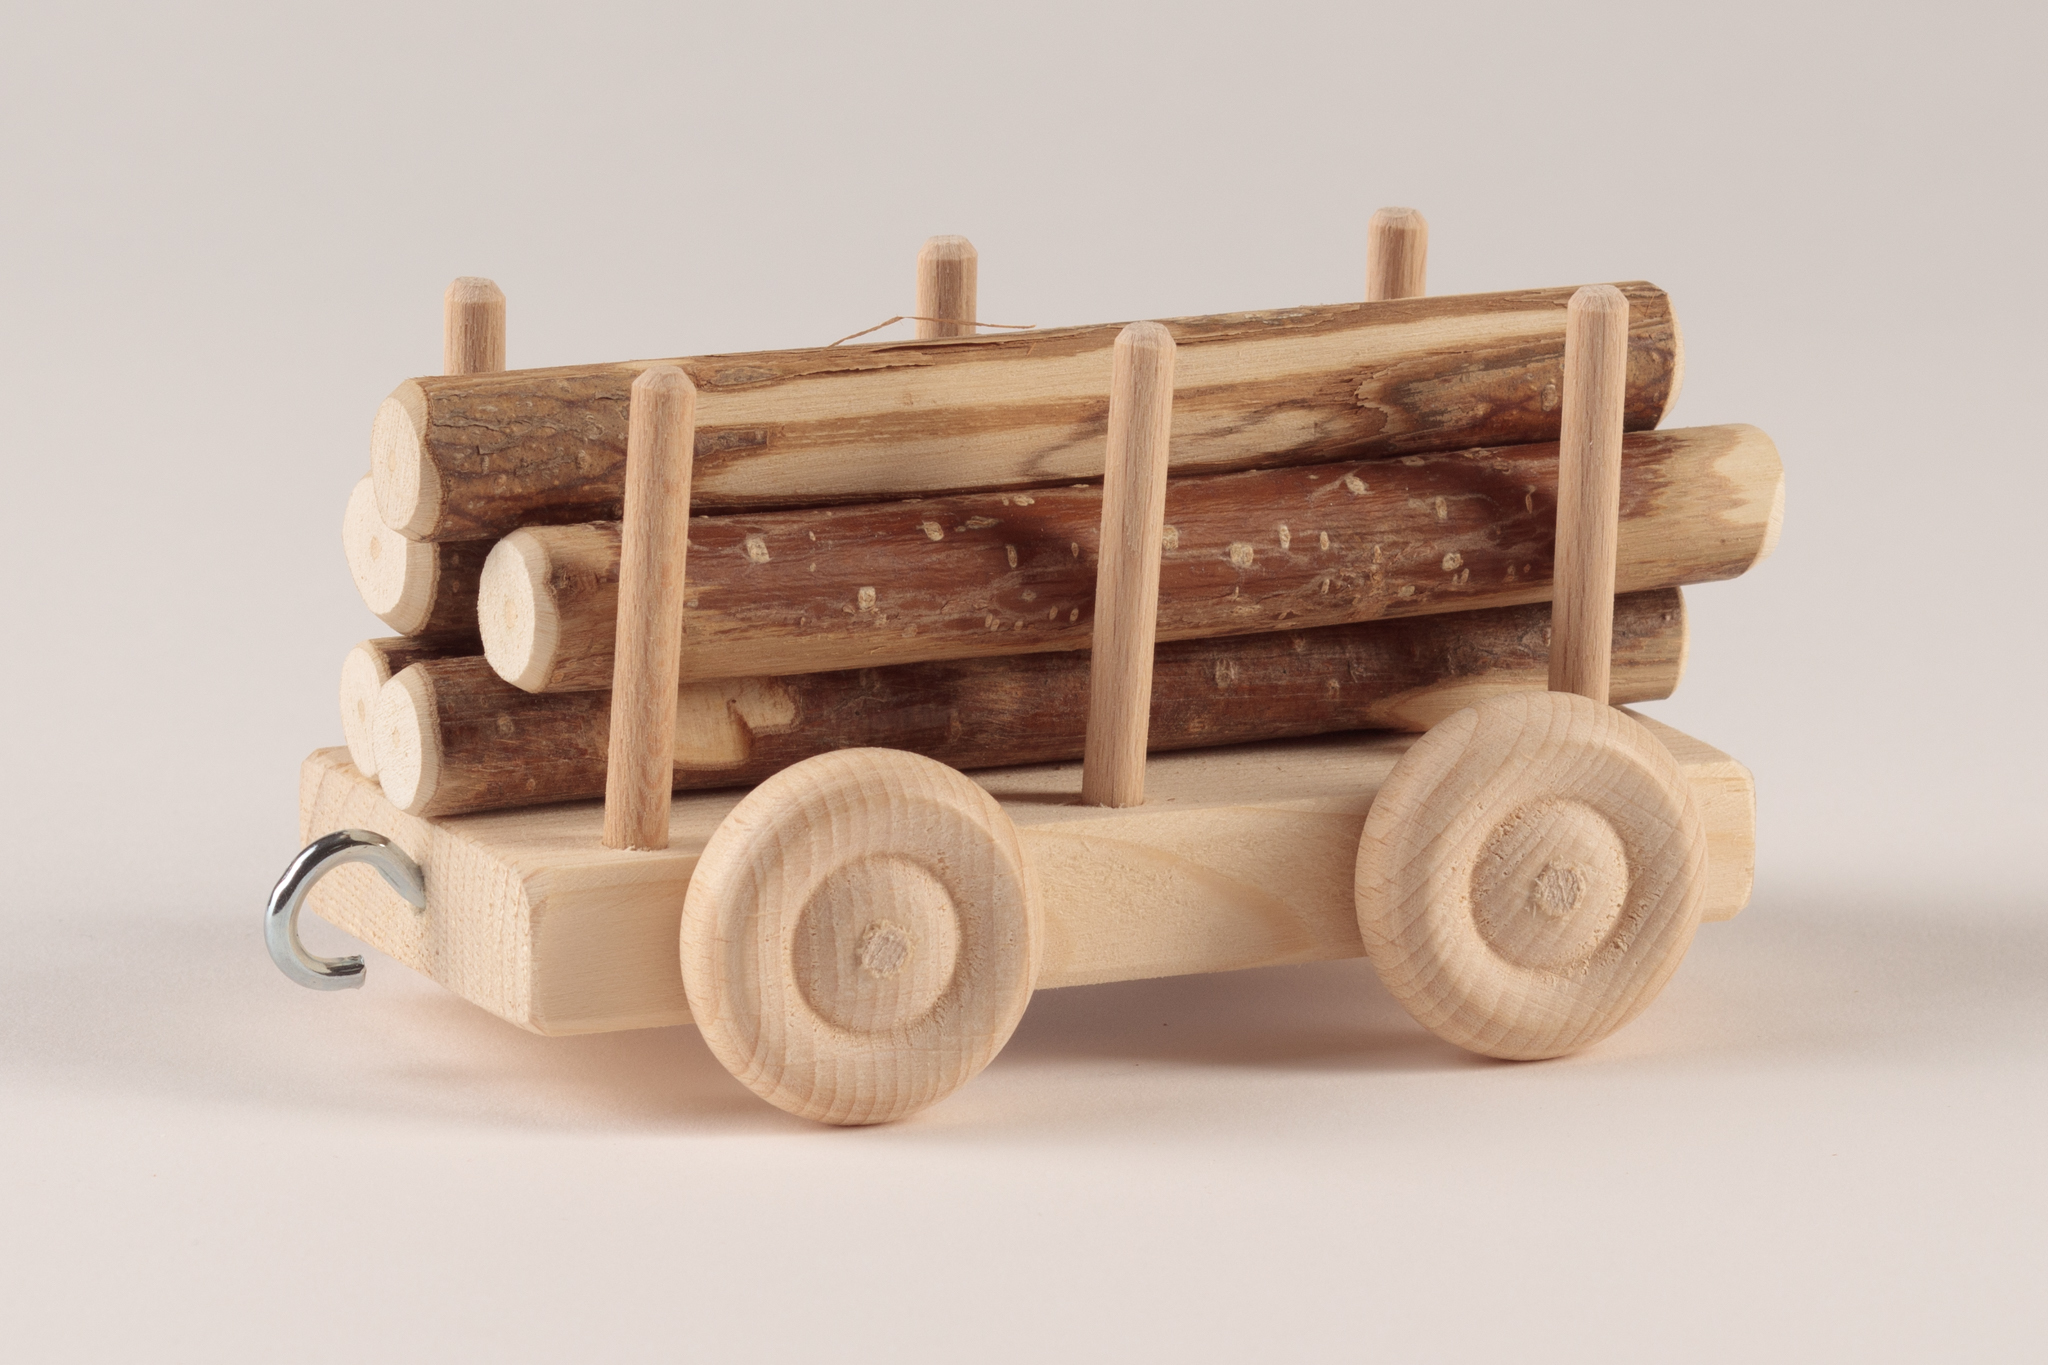 Holzspielzeug 10